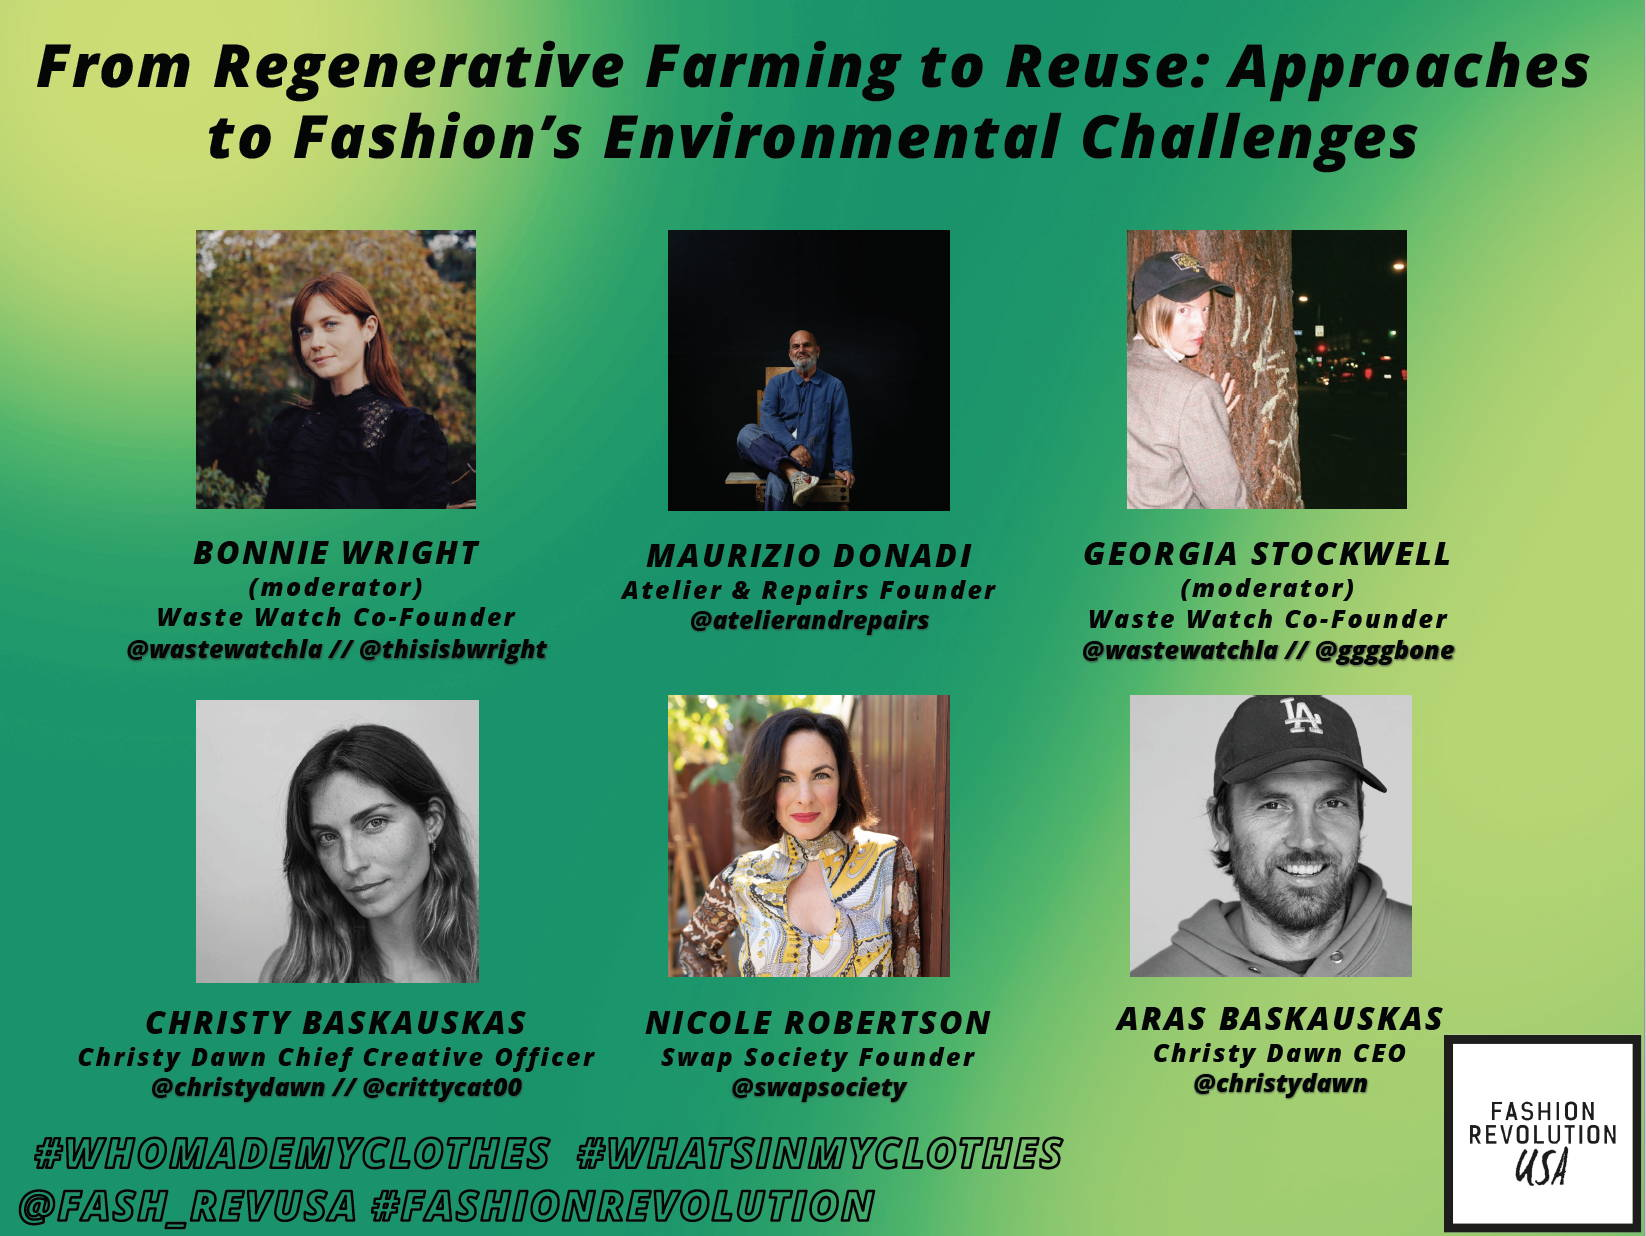 Fashion Revolution USA From Regenerative Farming to Reuse